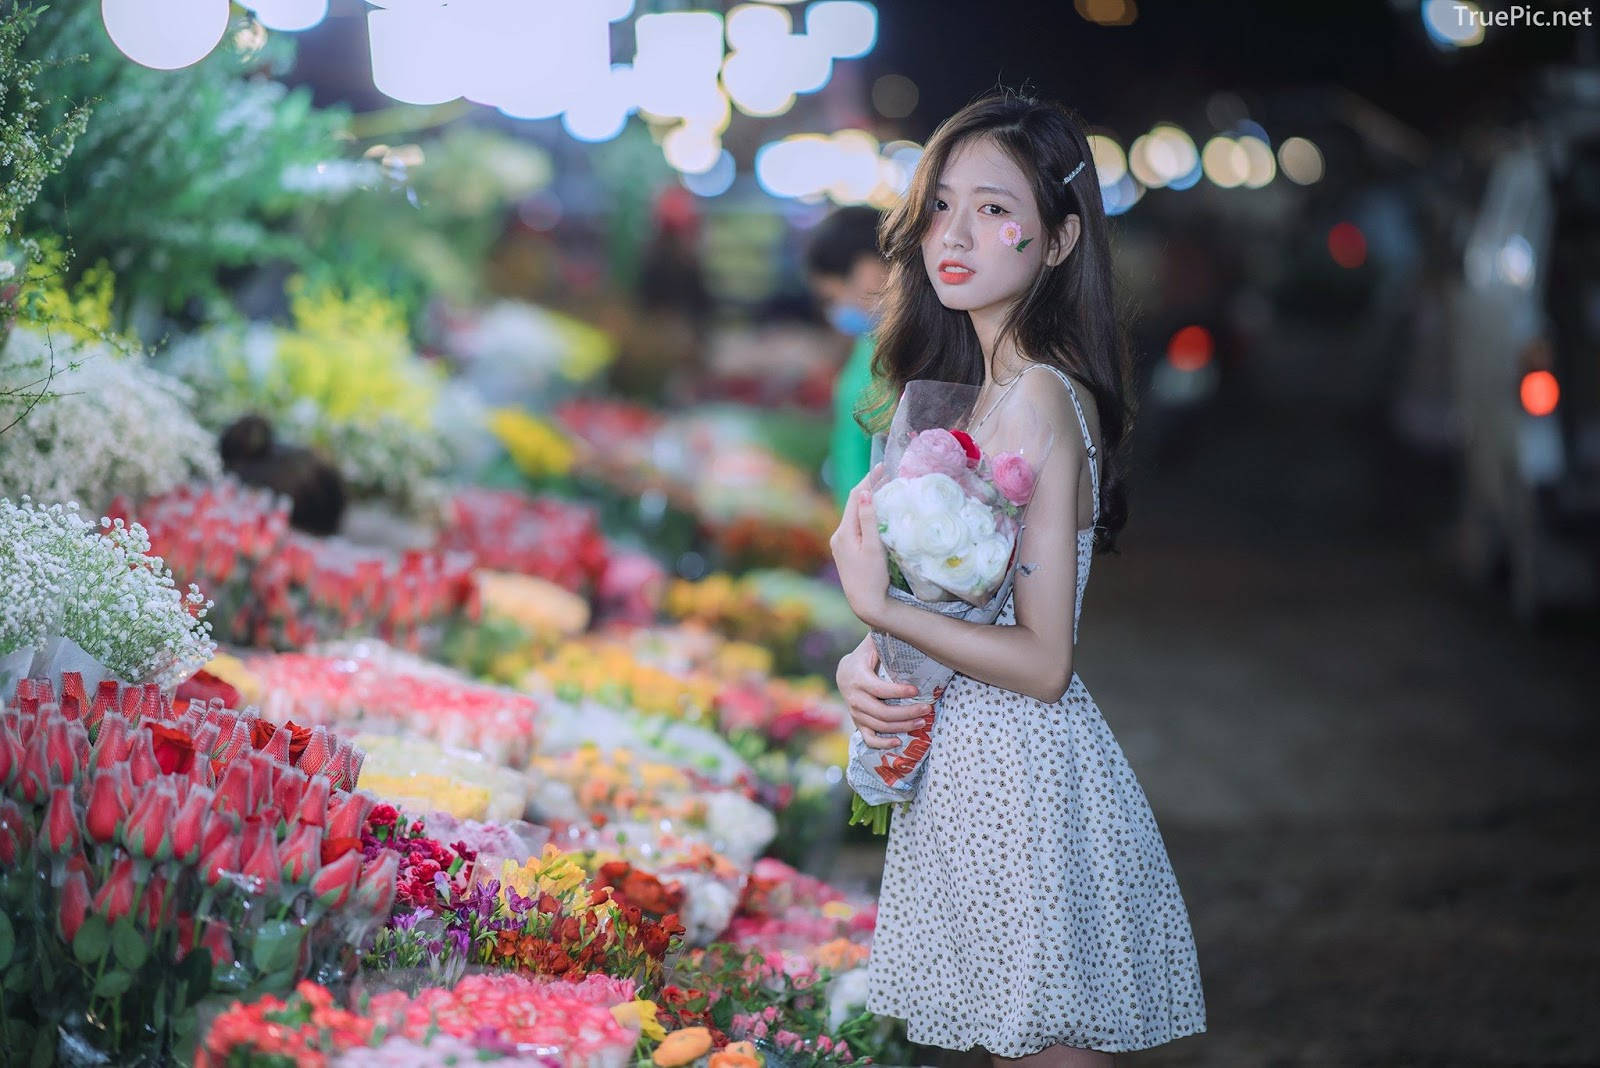 Vietnamese Hot Girl Linh Hoai - Strolling on the flower street - TruePic.net - Picture 9